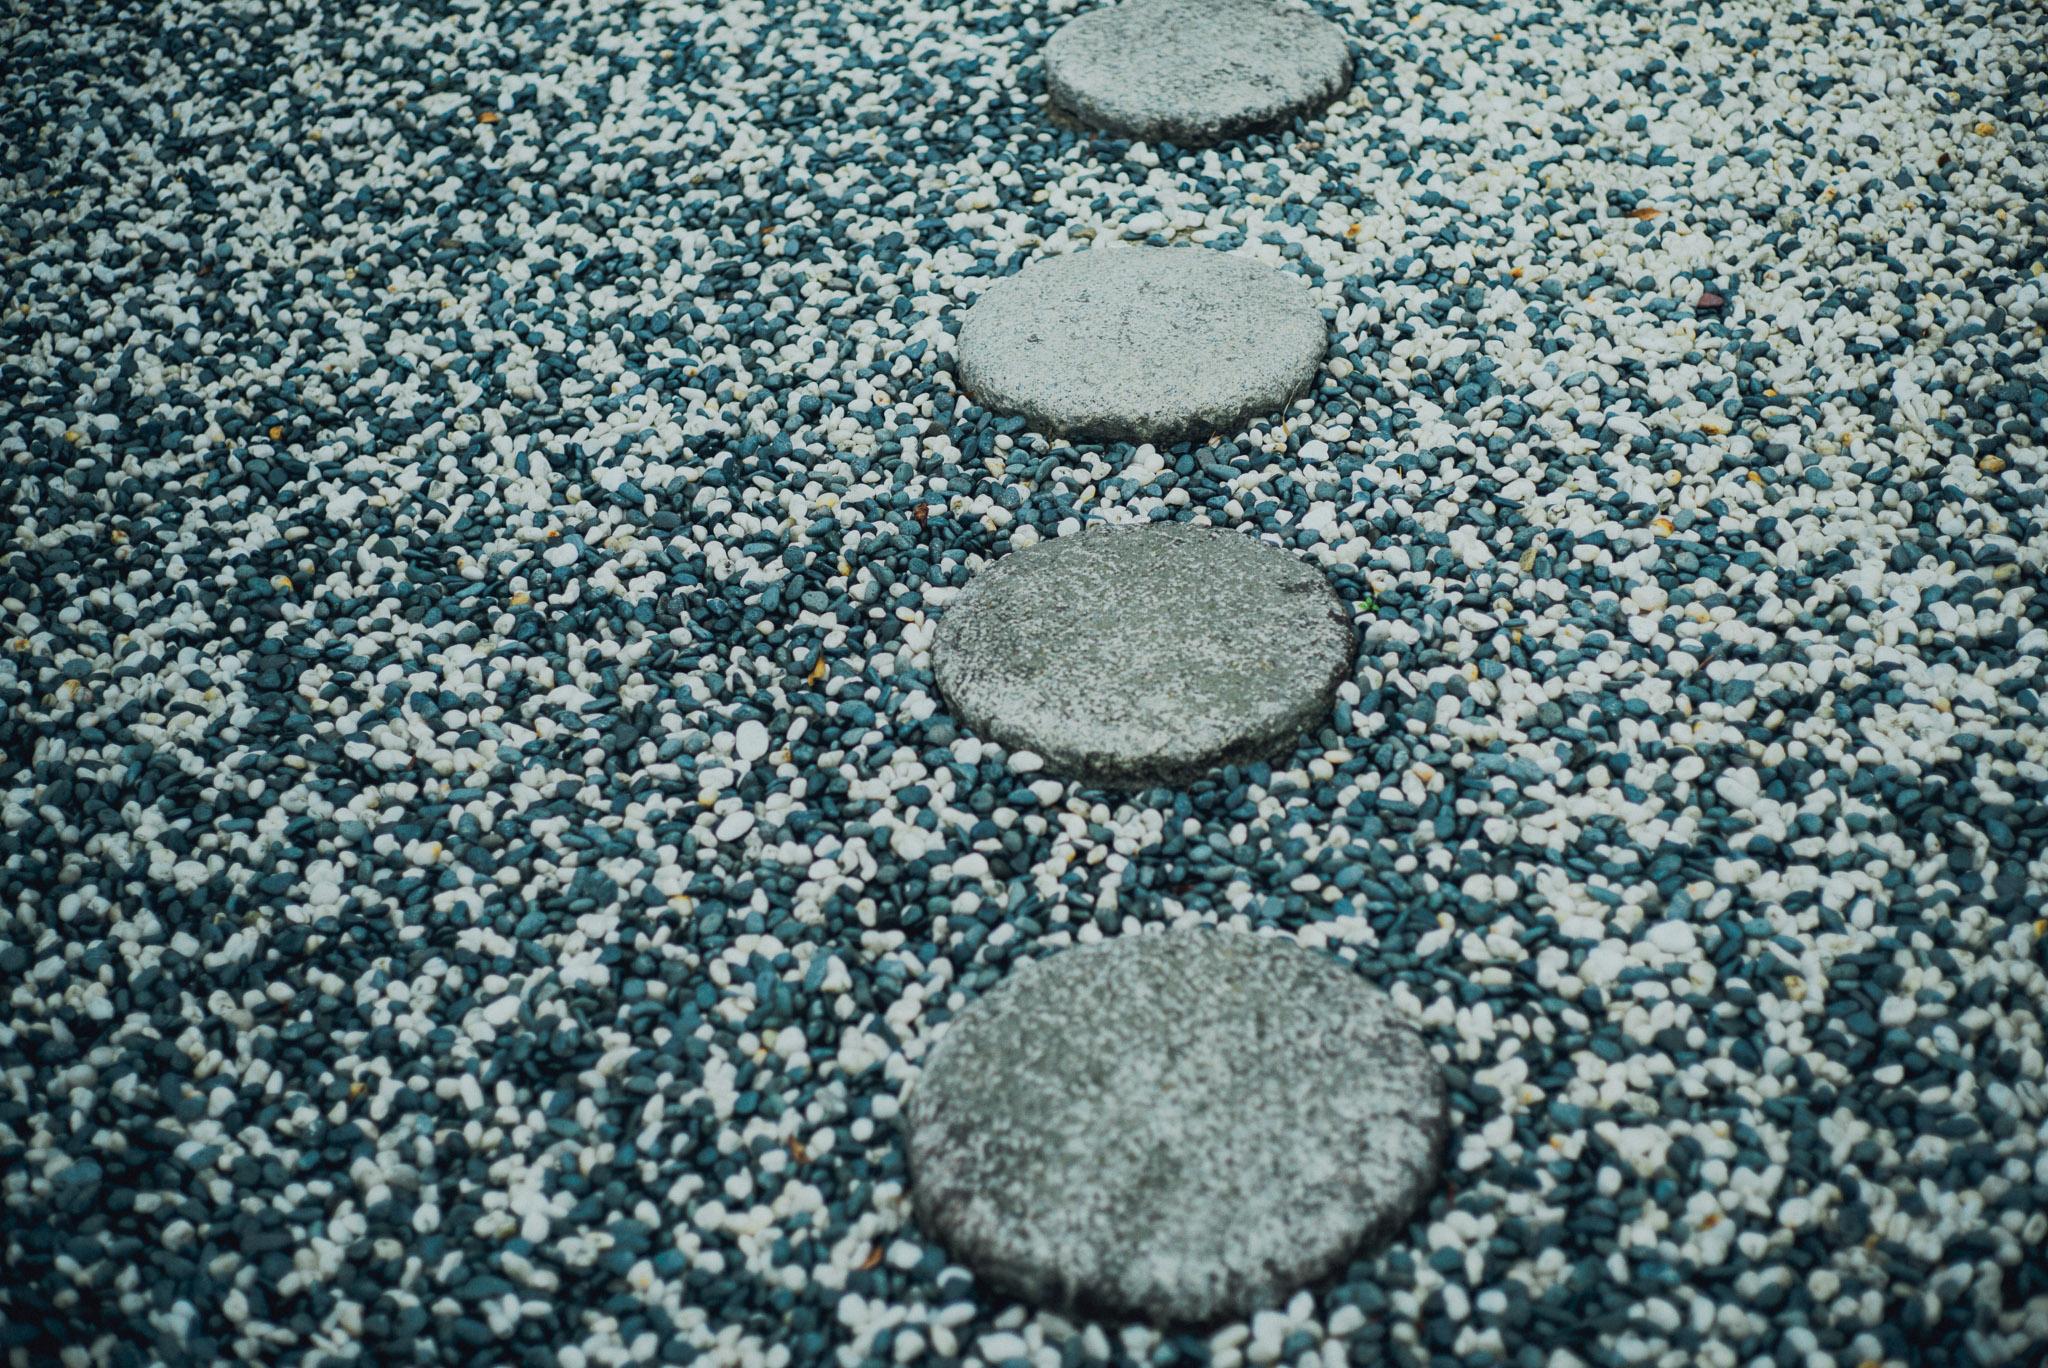 leica-mp-240-photographer-stone-steps